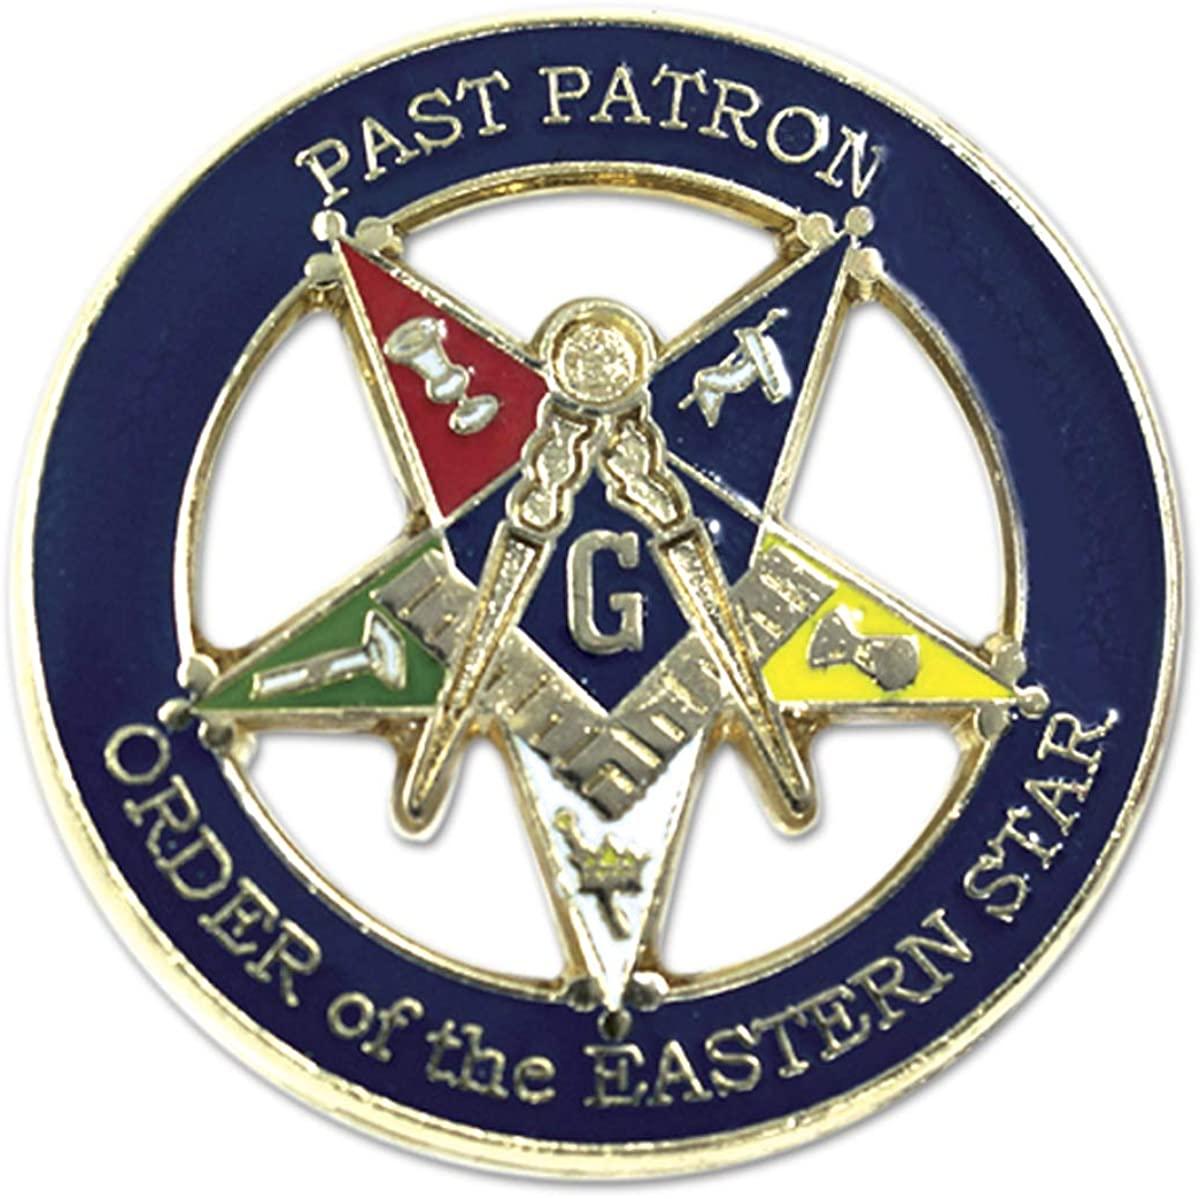 Past Patron Order of The Eastern Star Round Masonic Lapel Pin - [Blue & Gold][1'' Diameter]